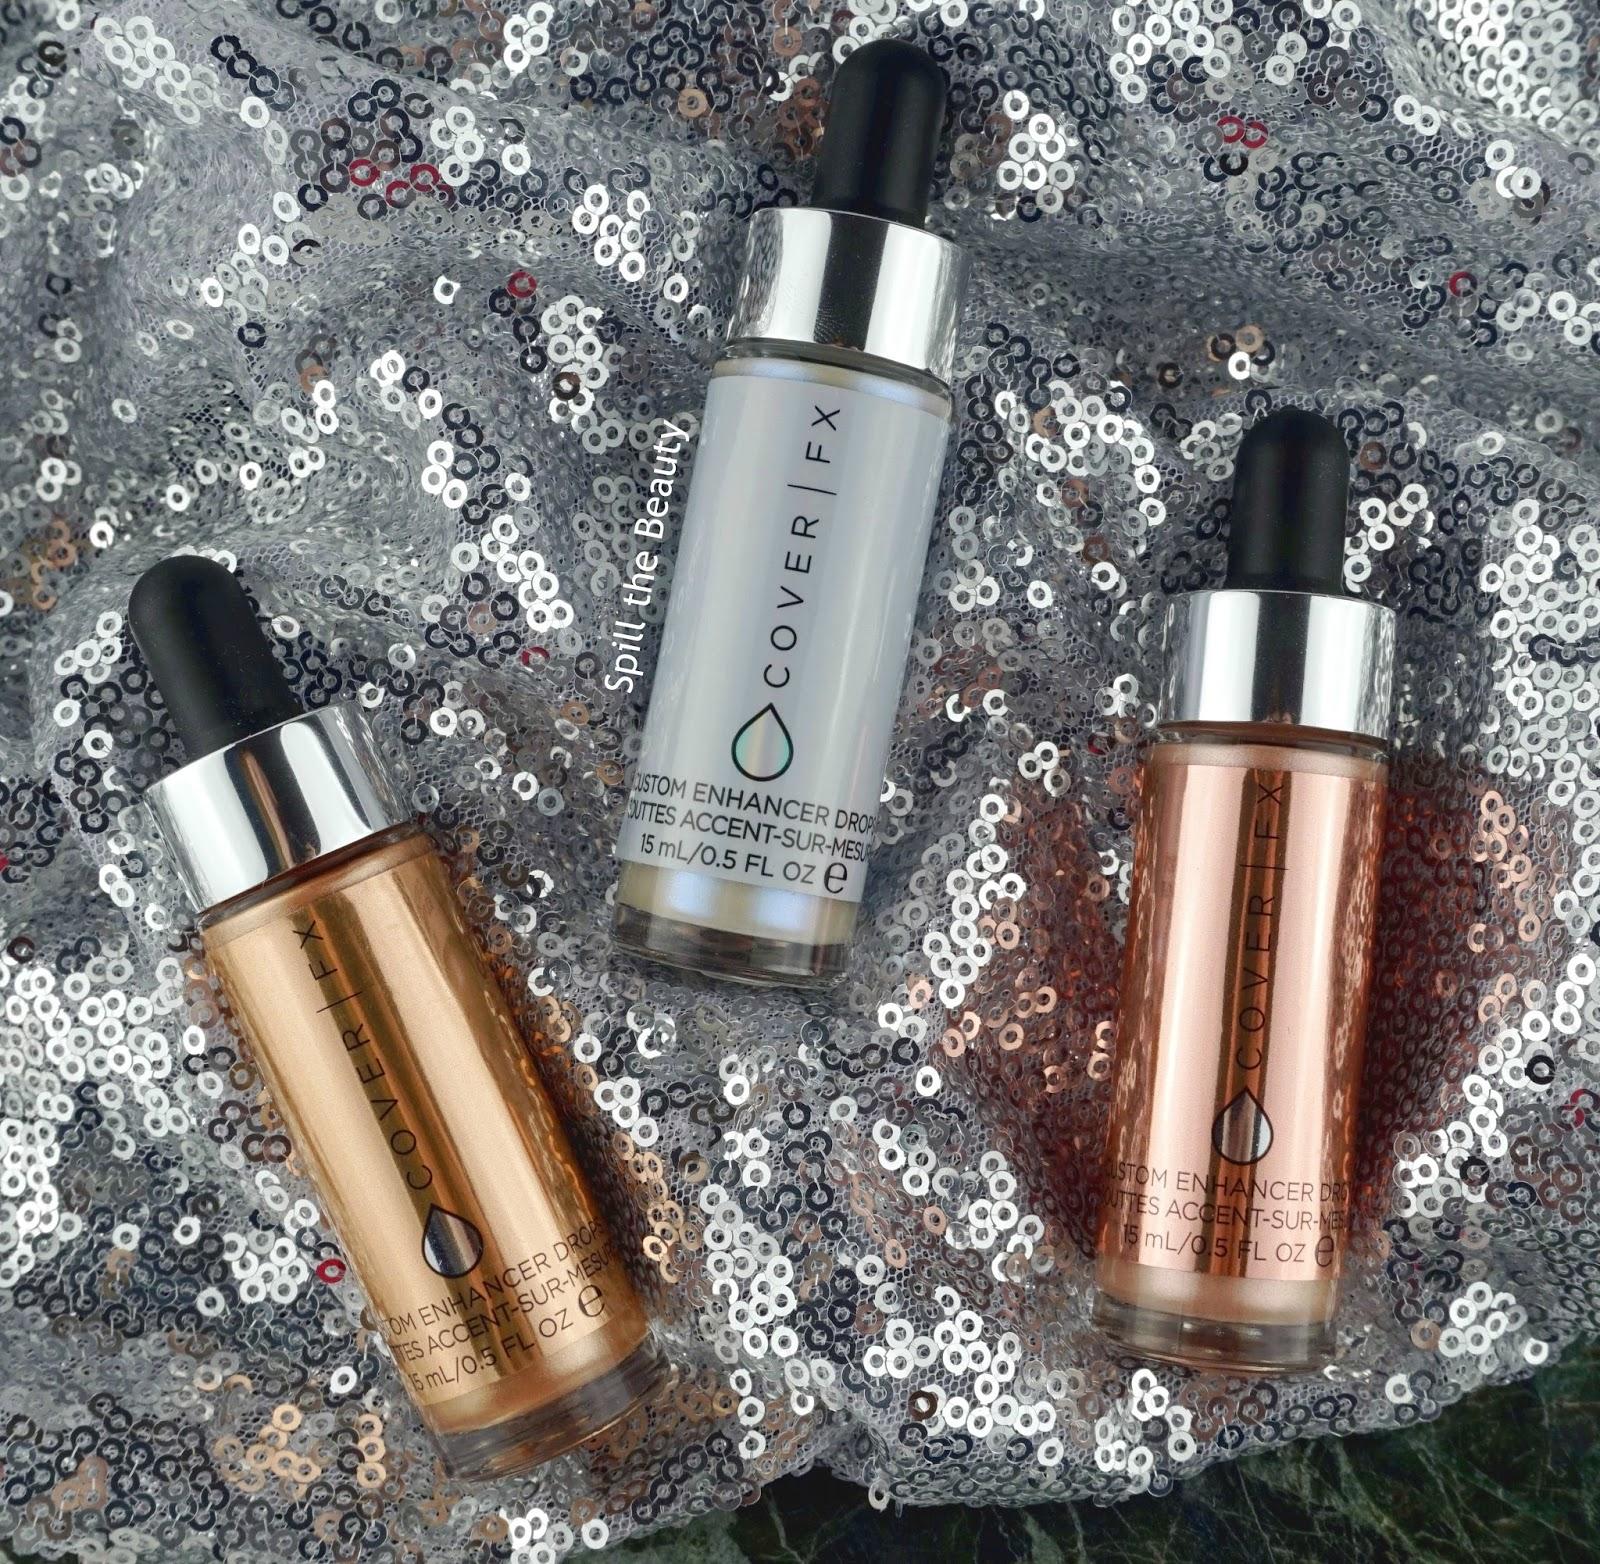 Cover FX Custom Enhancer Drops blossom halo rose gold highlighter review swatches